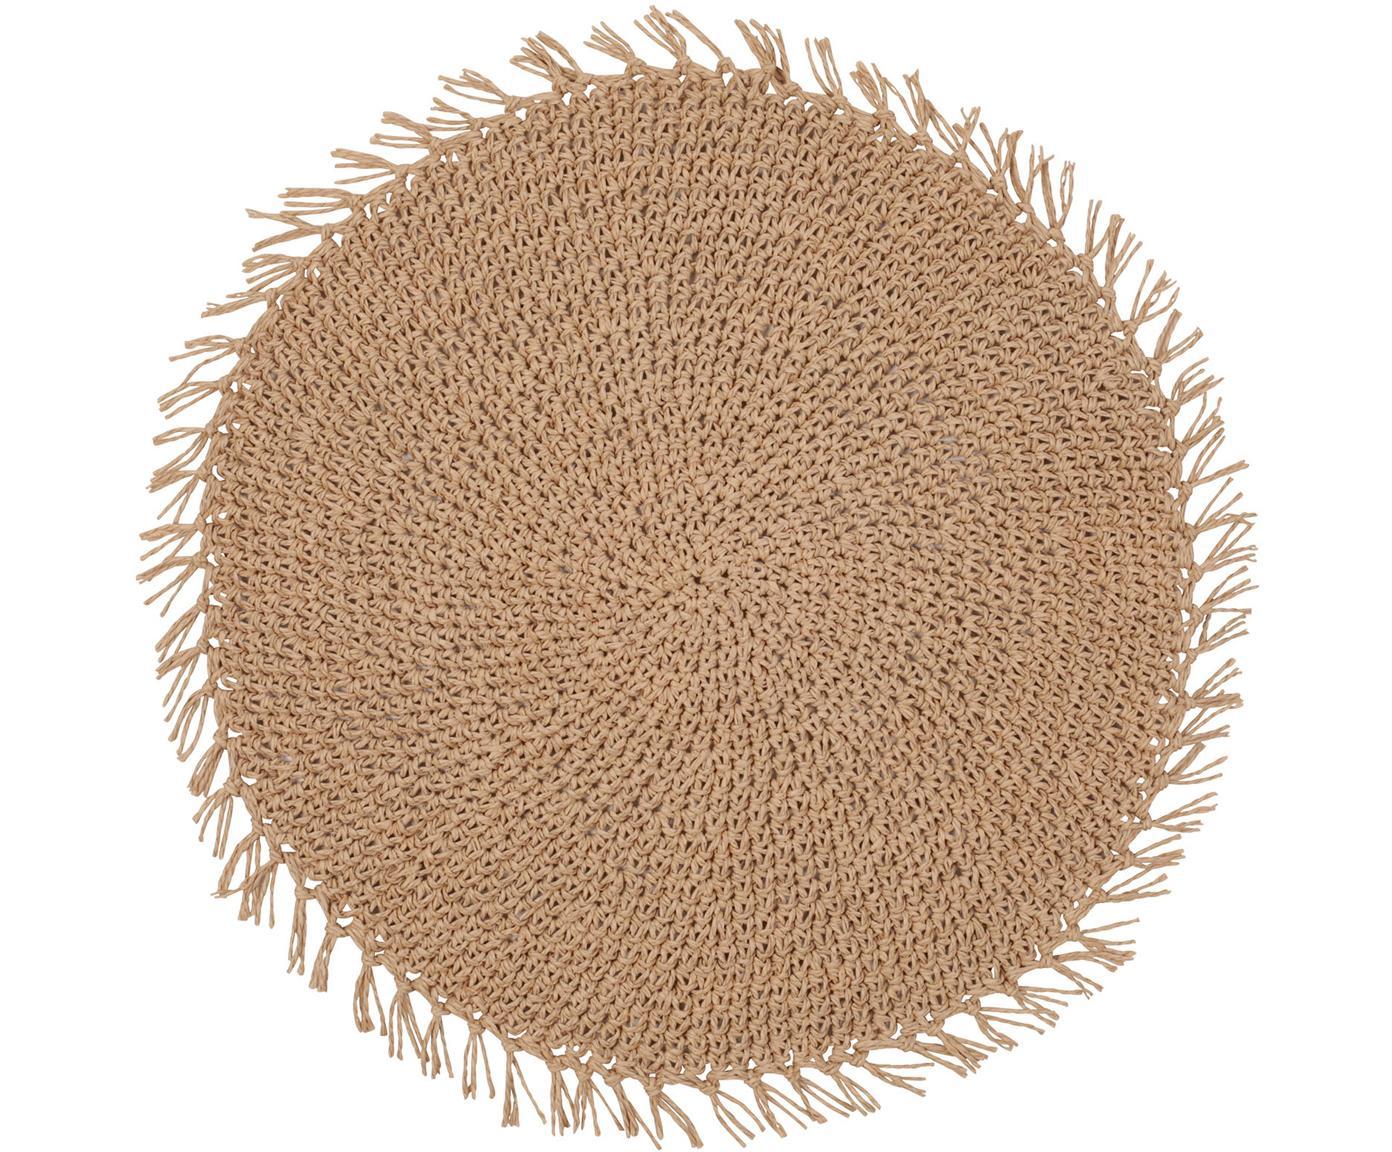 Manteles individuales redondos Tressine, 6uds., Fibras de papel trenzados, Beige, Ø 38 cm